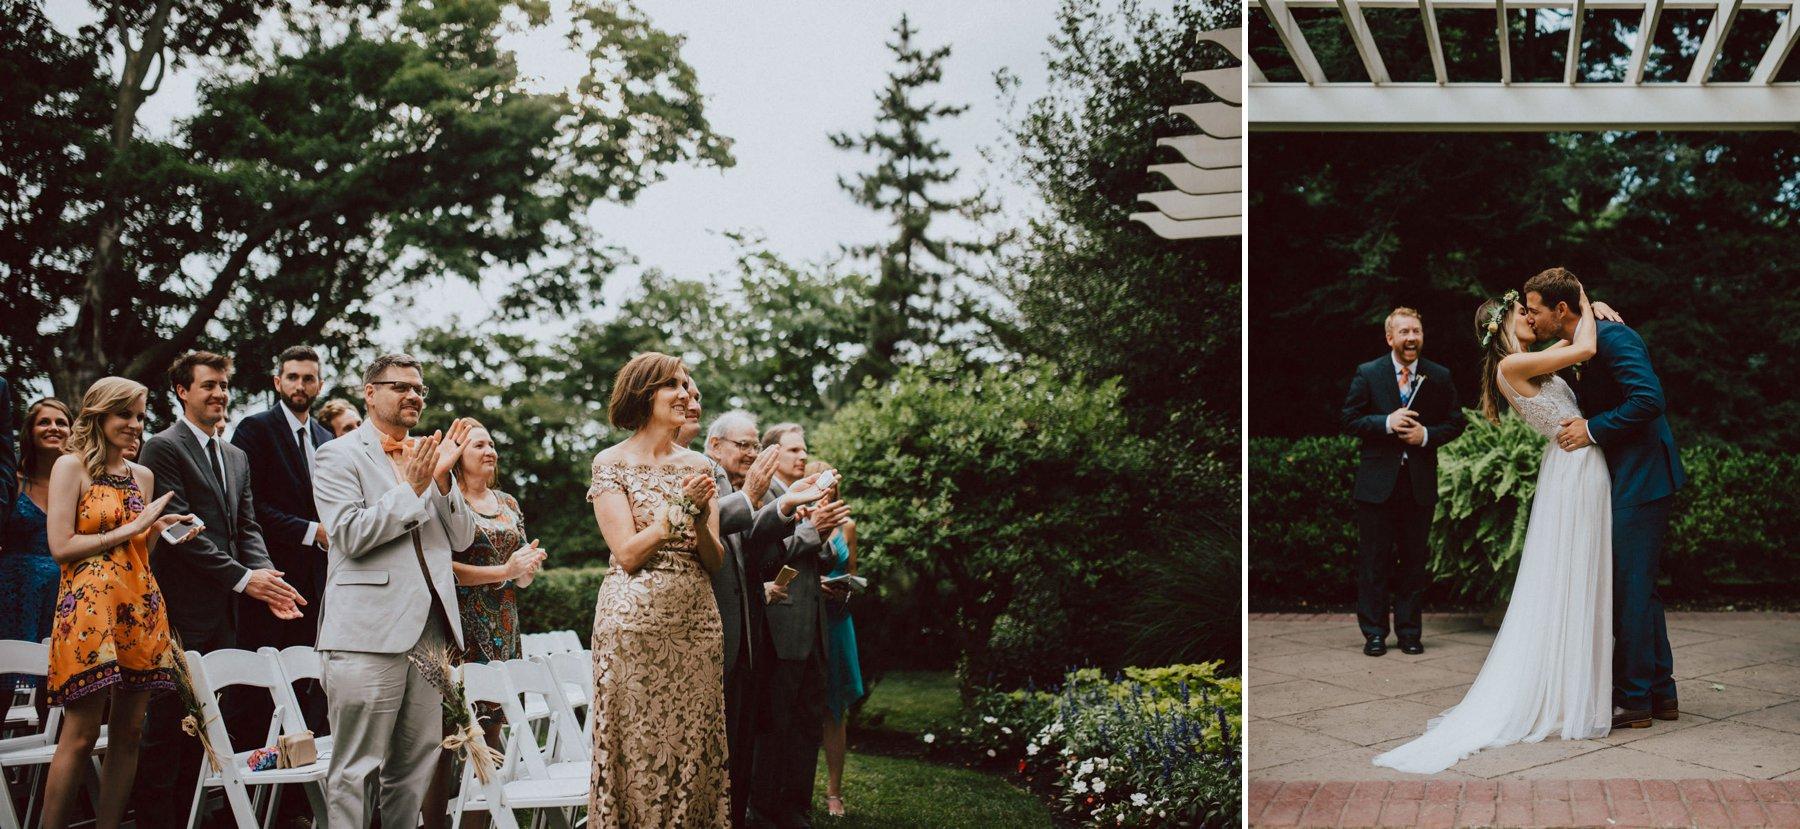 Knowlton-mansion-wedding-102.jpg